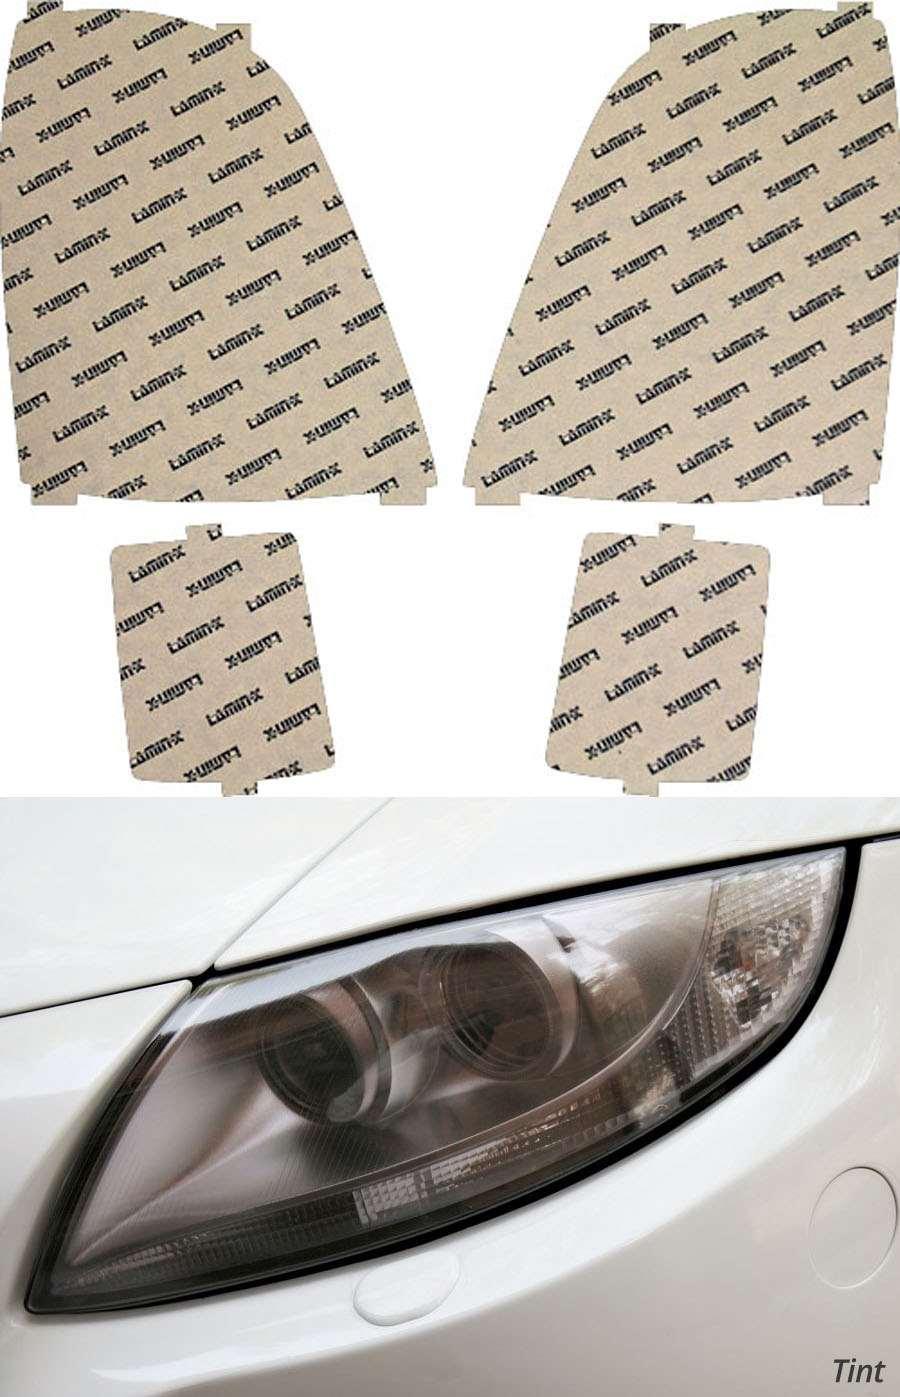 Cadillac SRX 03-09 Tint Headlight Covers Lamin-X CD006T